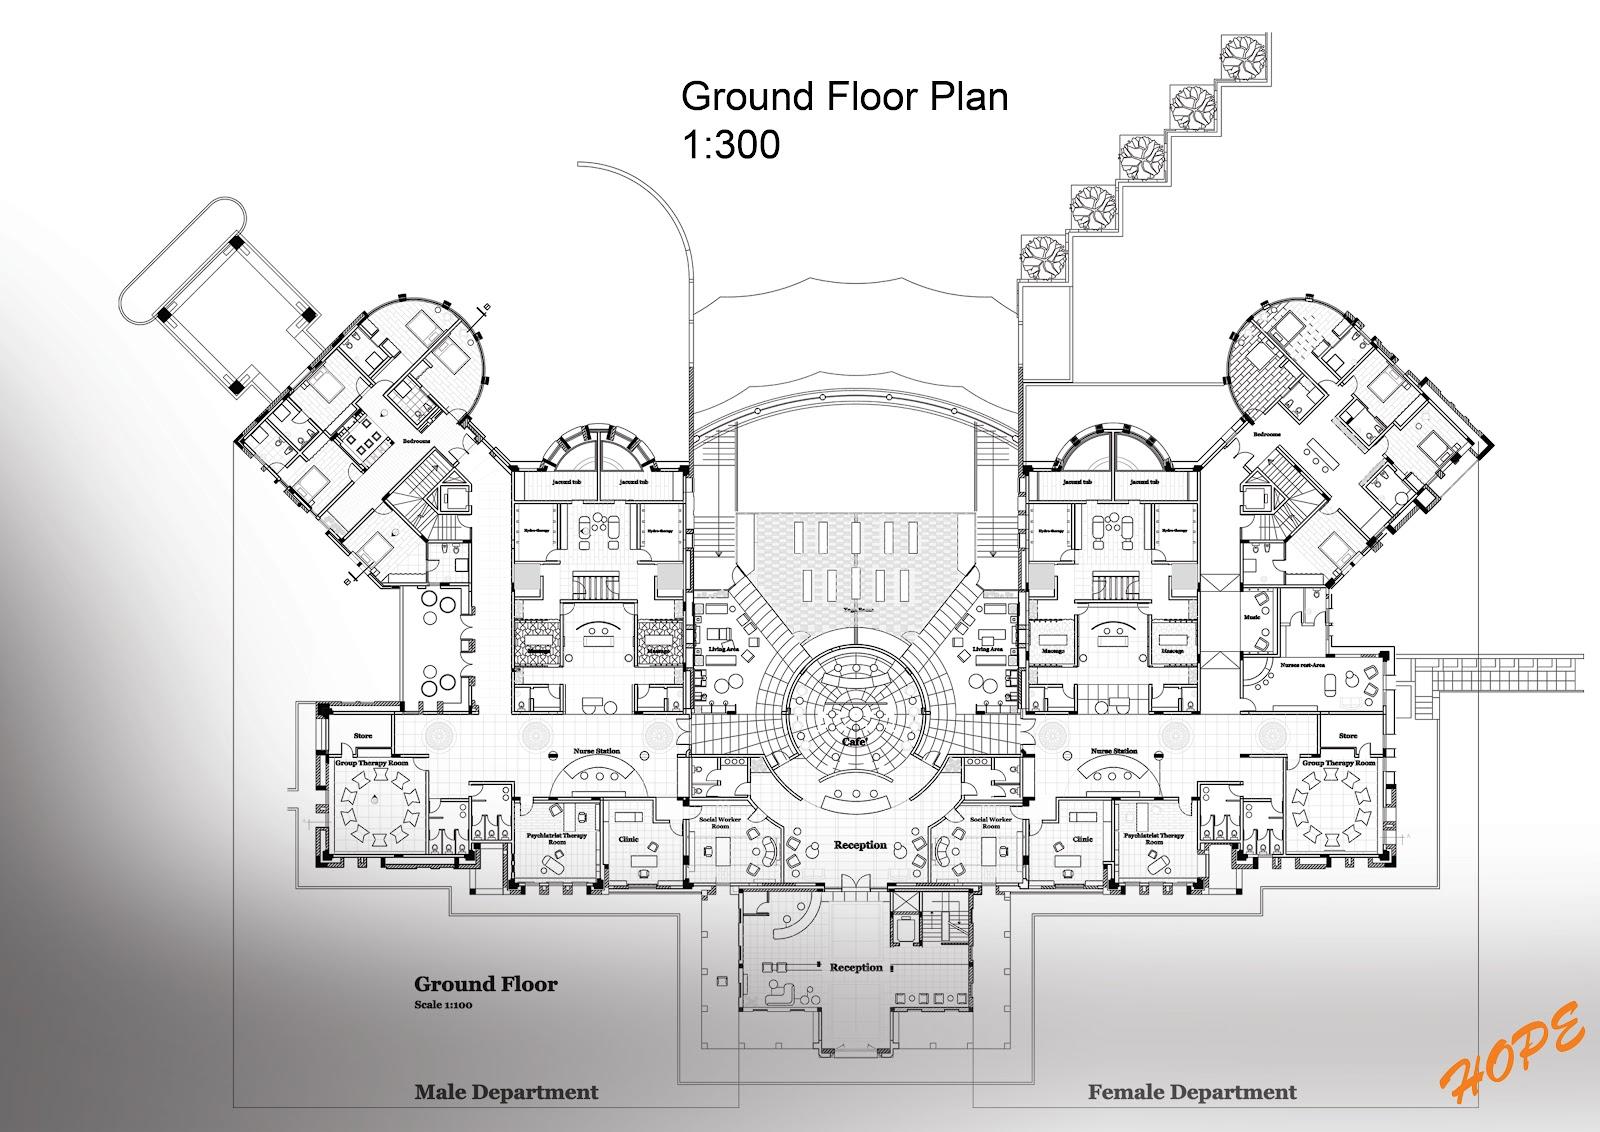 rehabilitation Center Floor Plan Free 100 Images